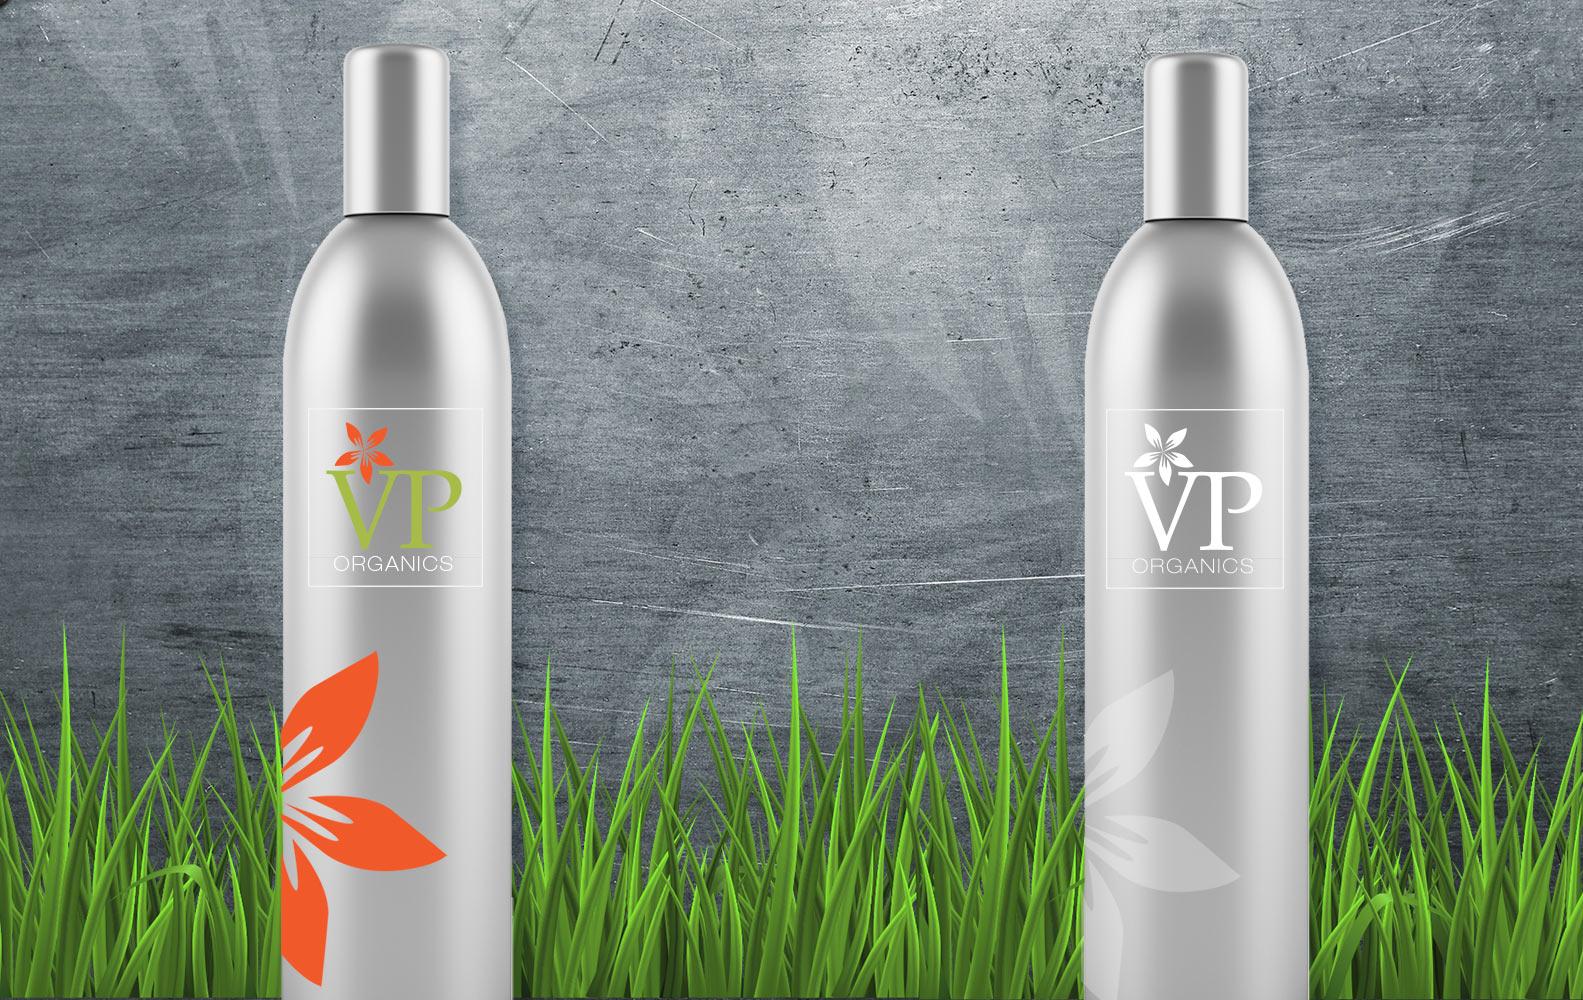 VP Organics